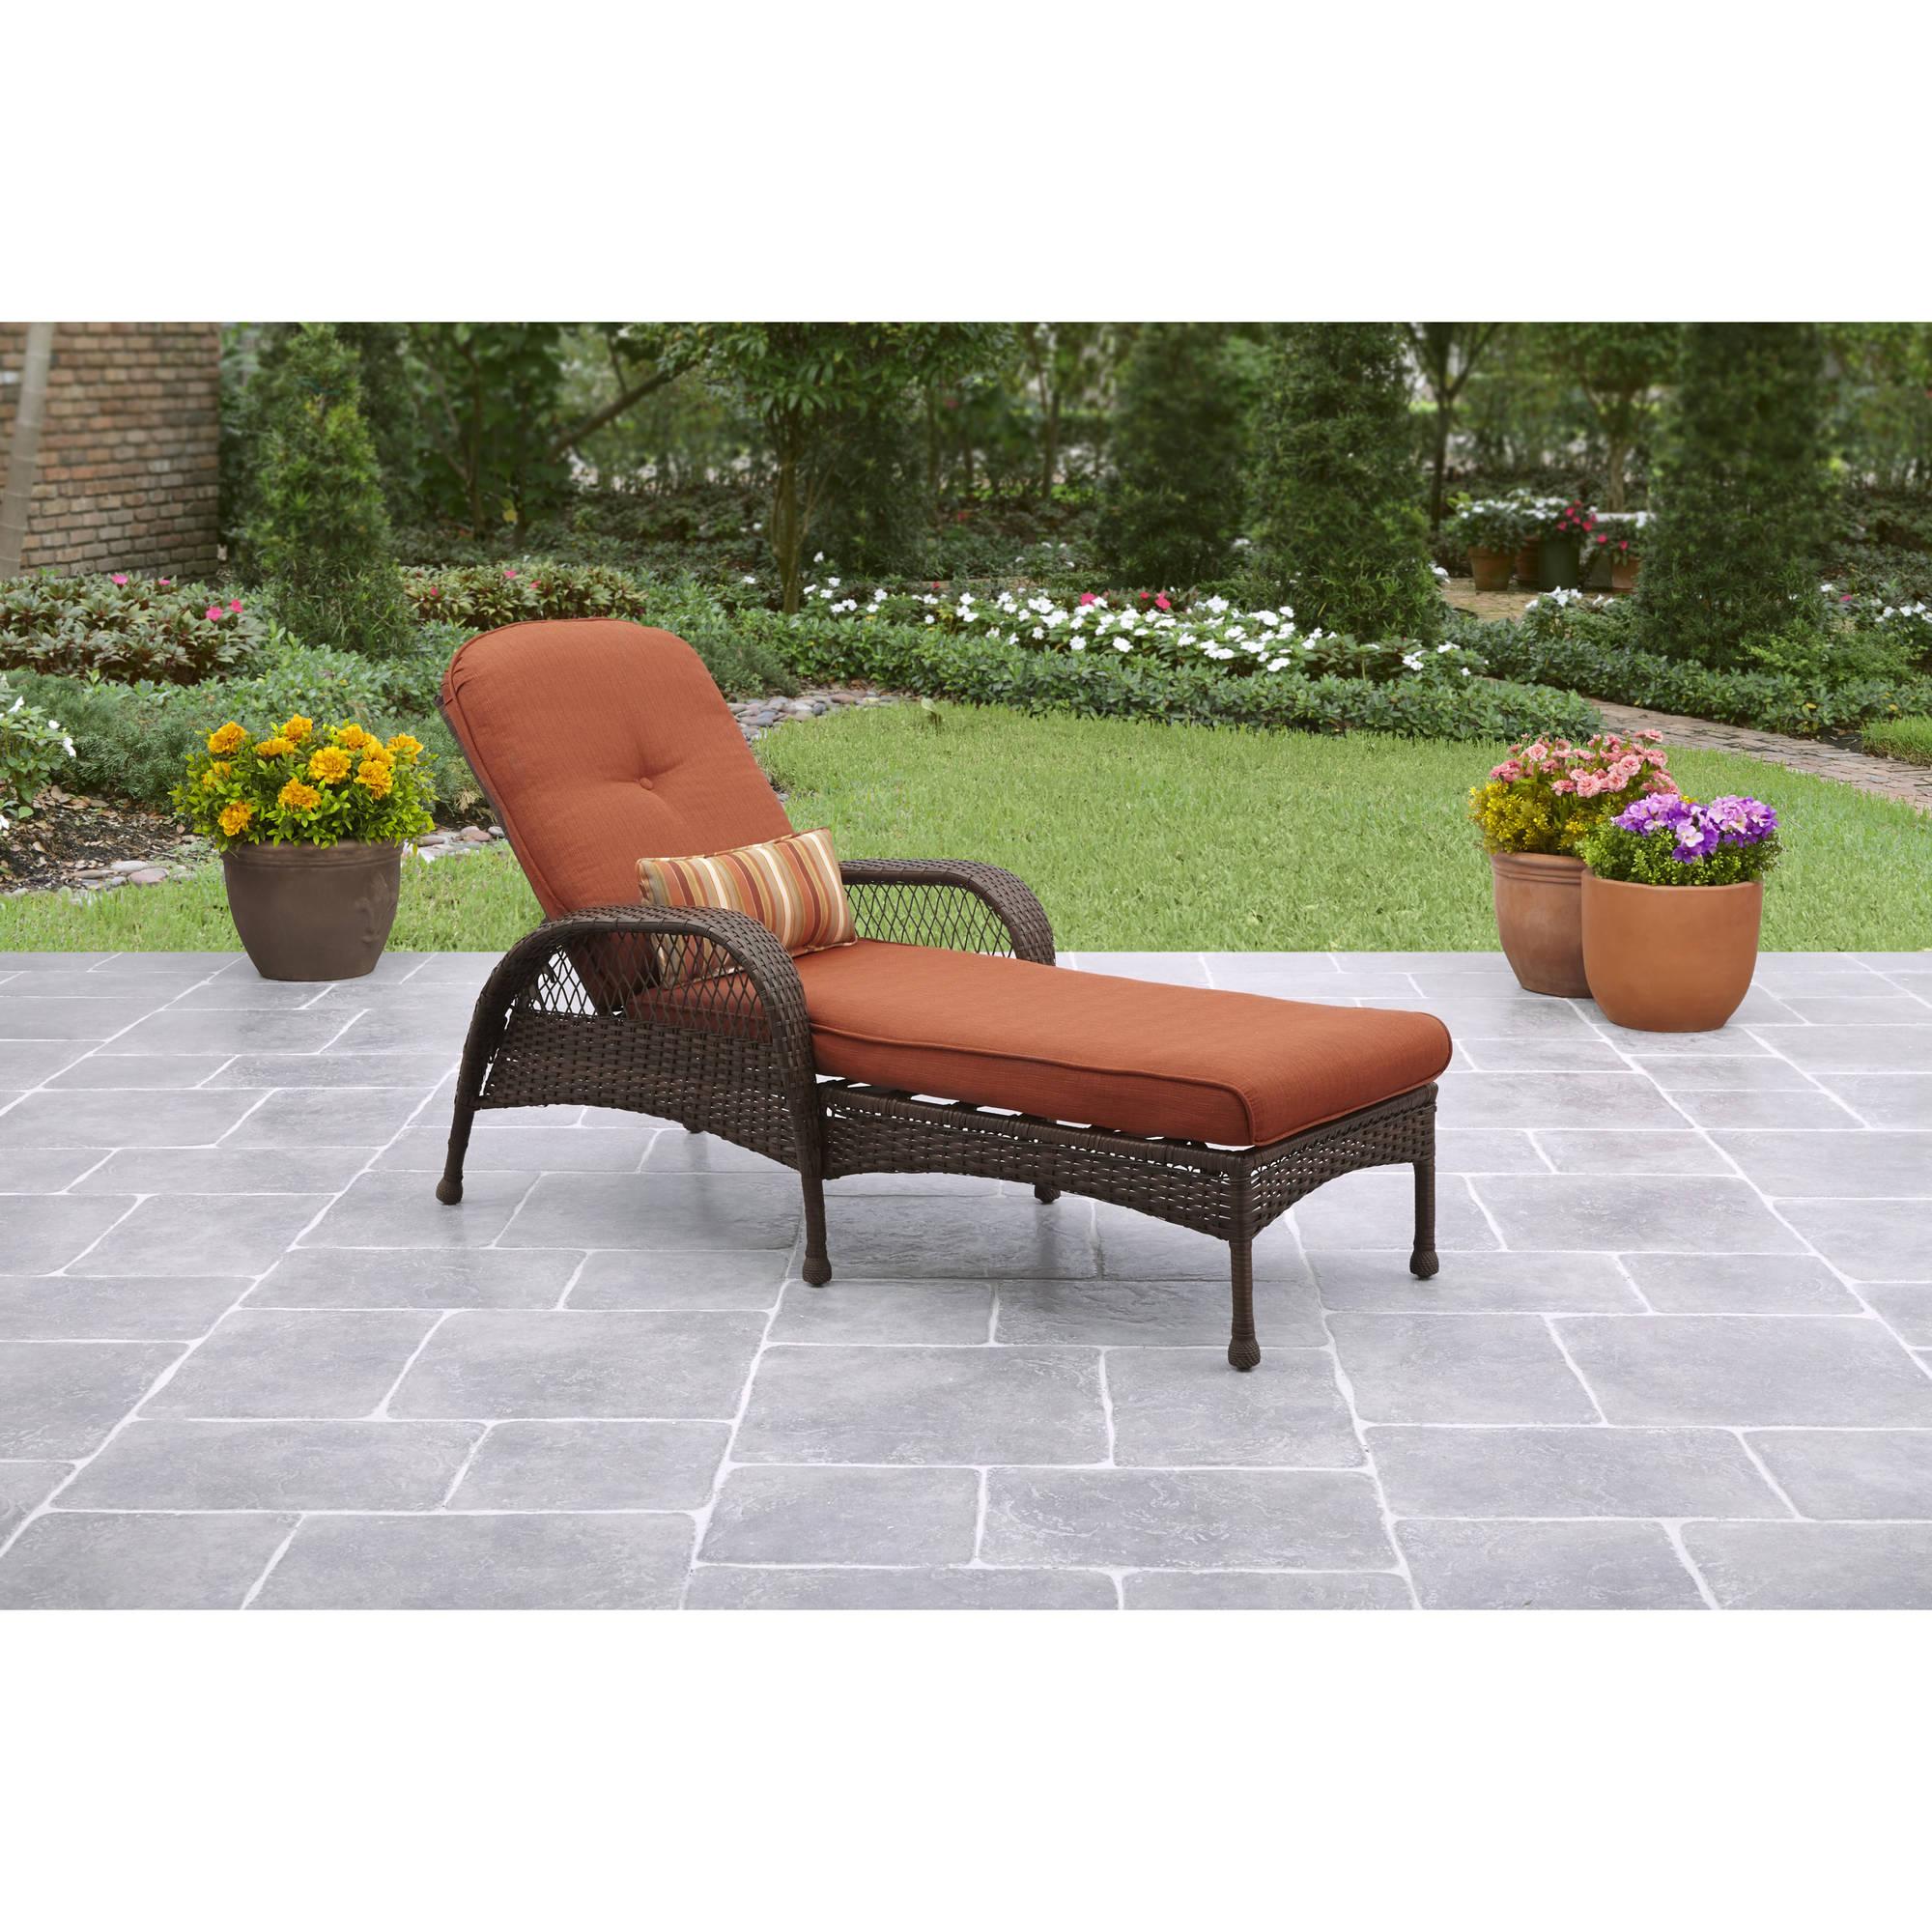 Better Homes and Gardens Azalea Ridge Outdoor Chaise Lounge